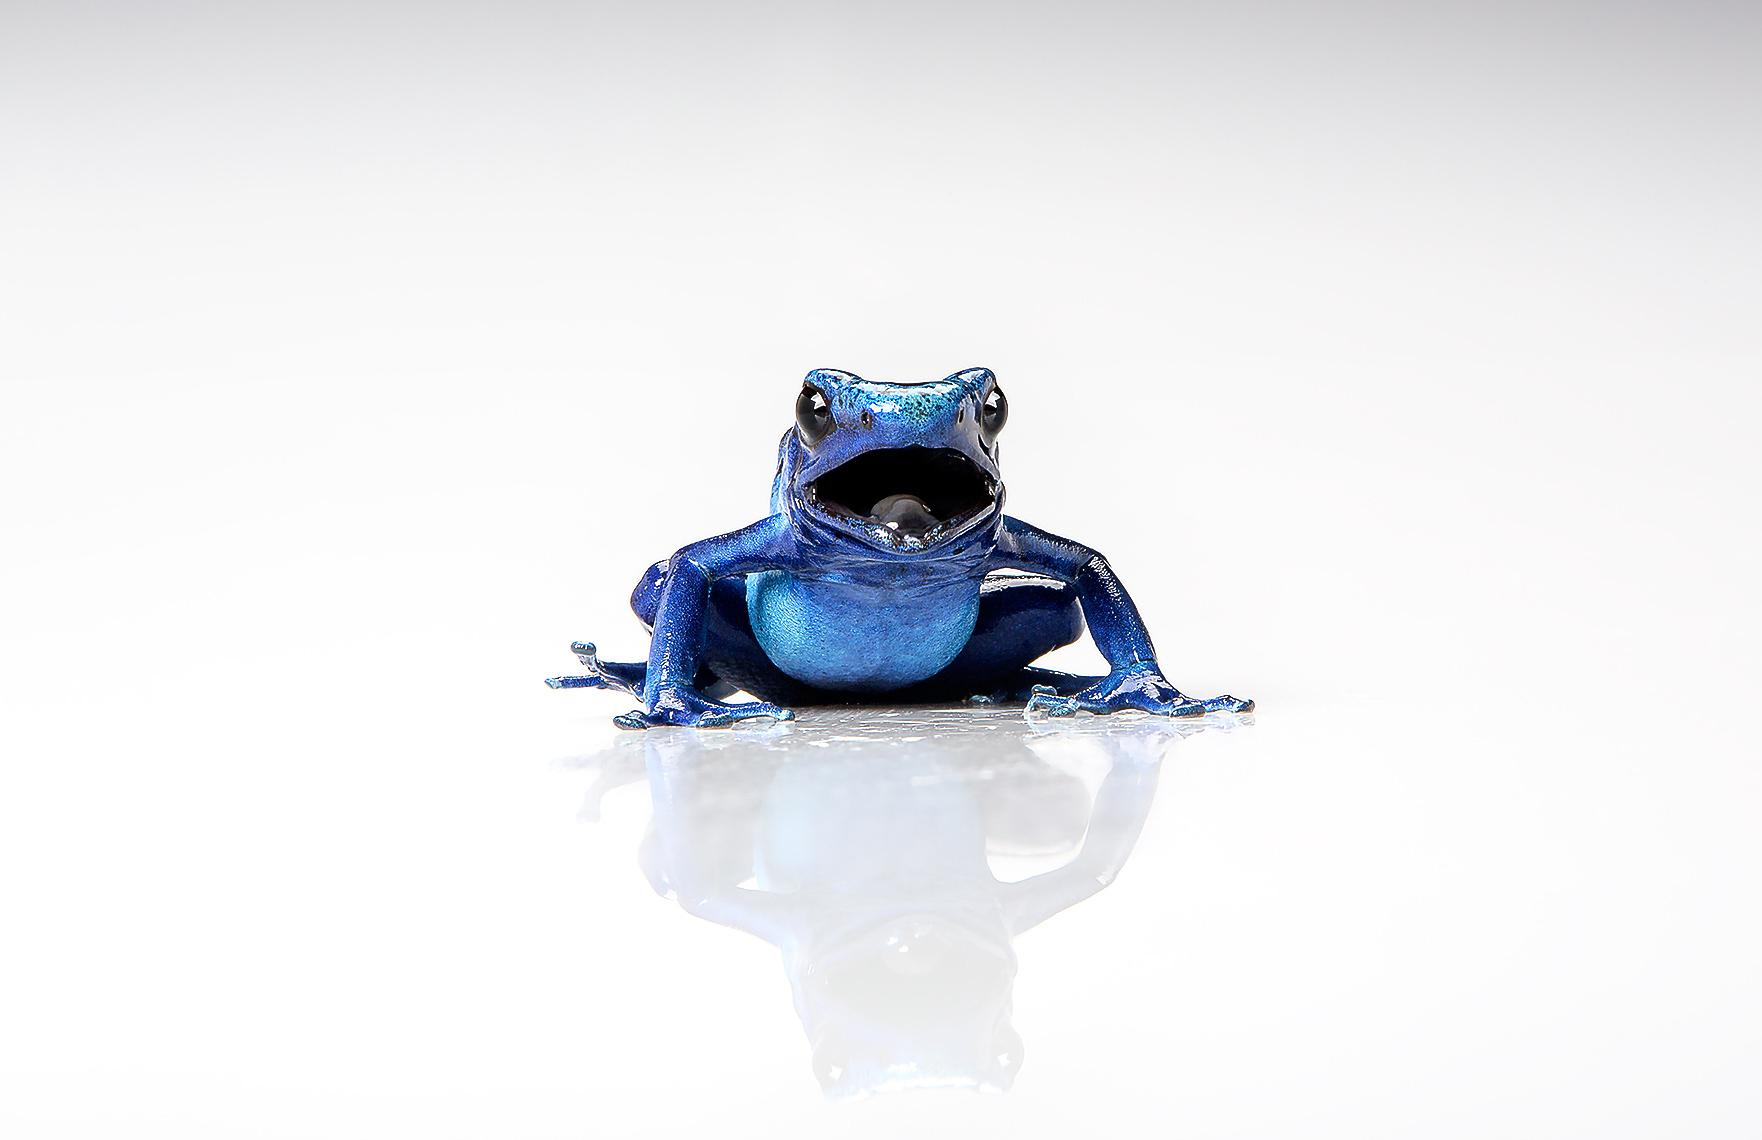 BlueDartFrog-0419_r1_17x11websharp.jpg